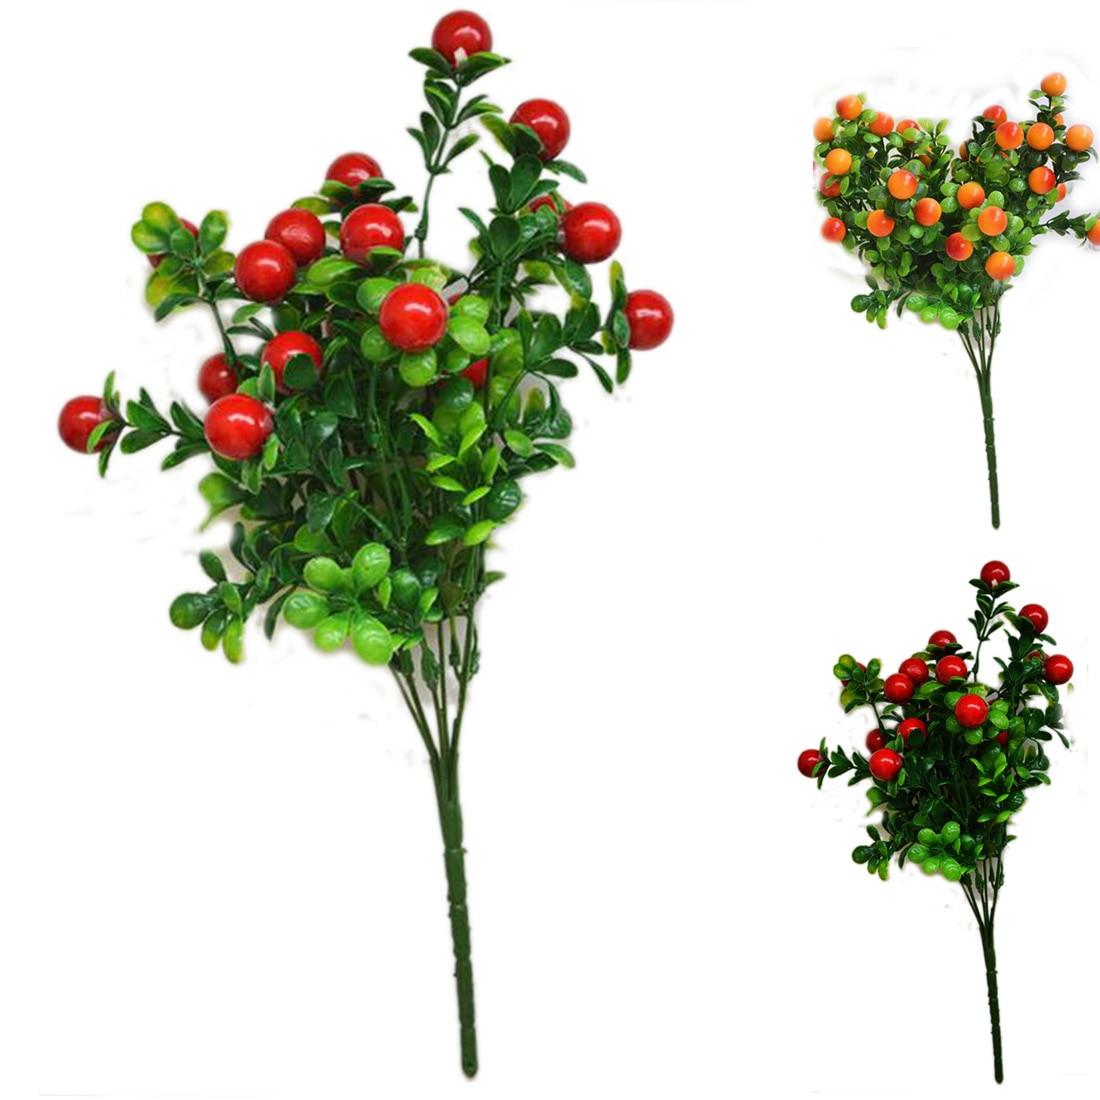 Hot Home Decoration Artificial Plants Simulation of Fruit 6 Branch Rich Fruit